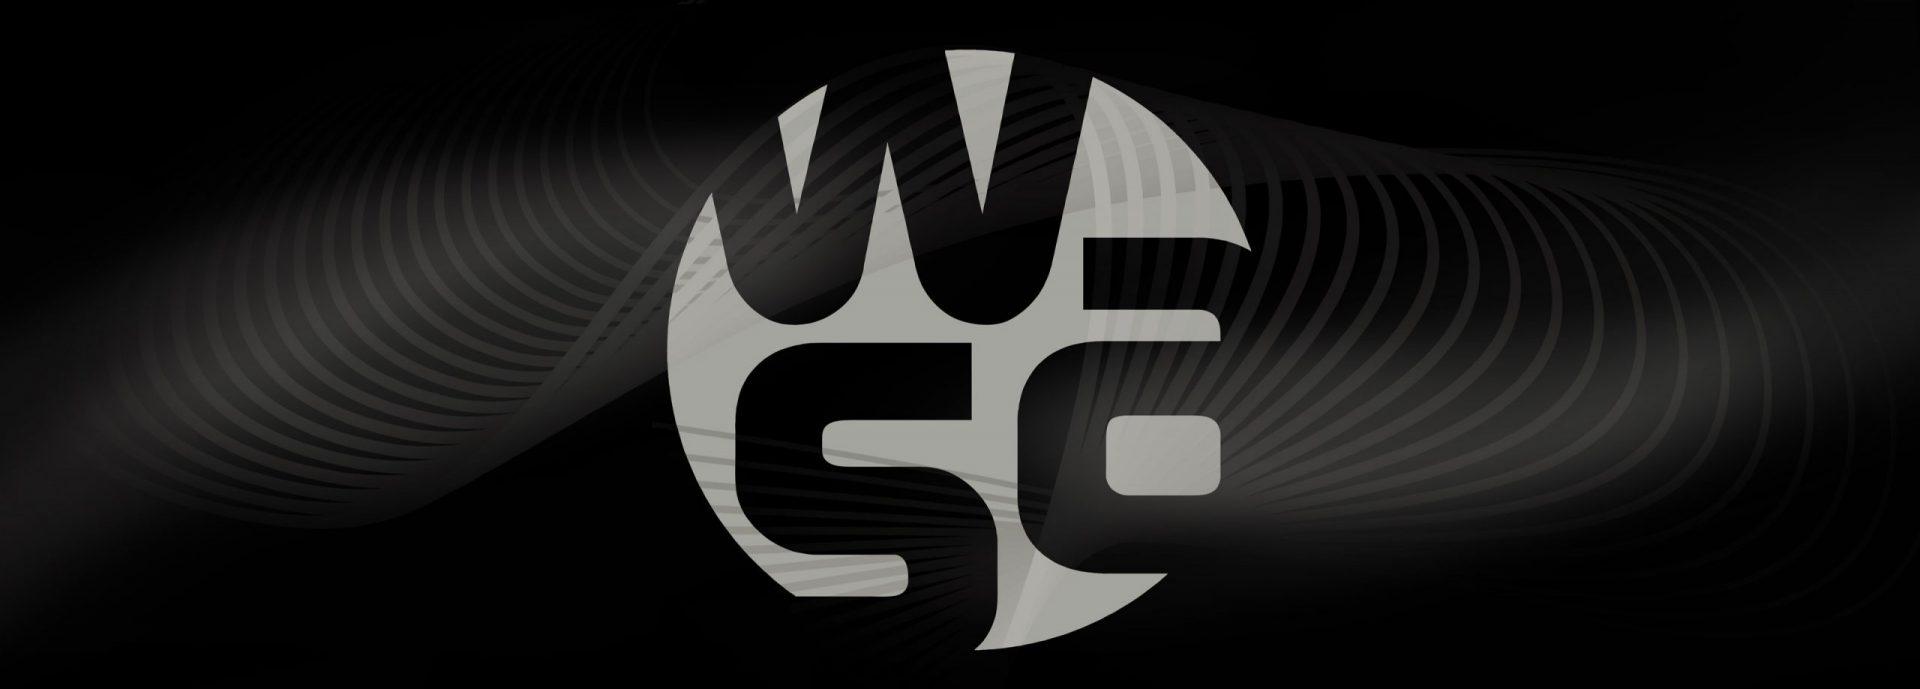 ws-artconcept